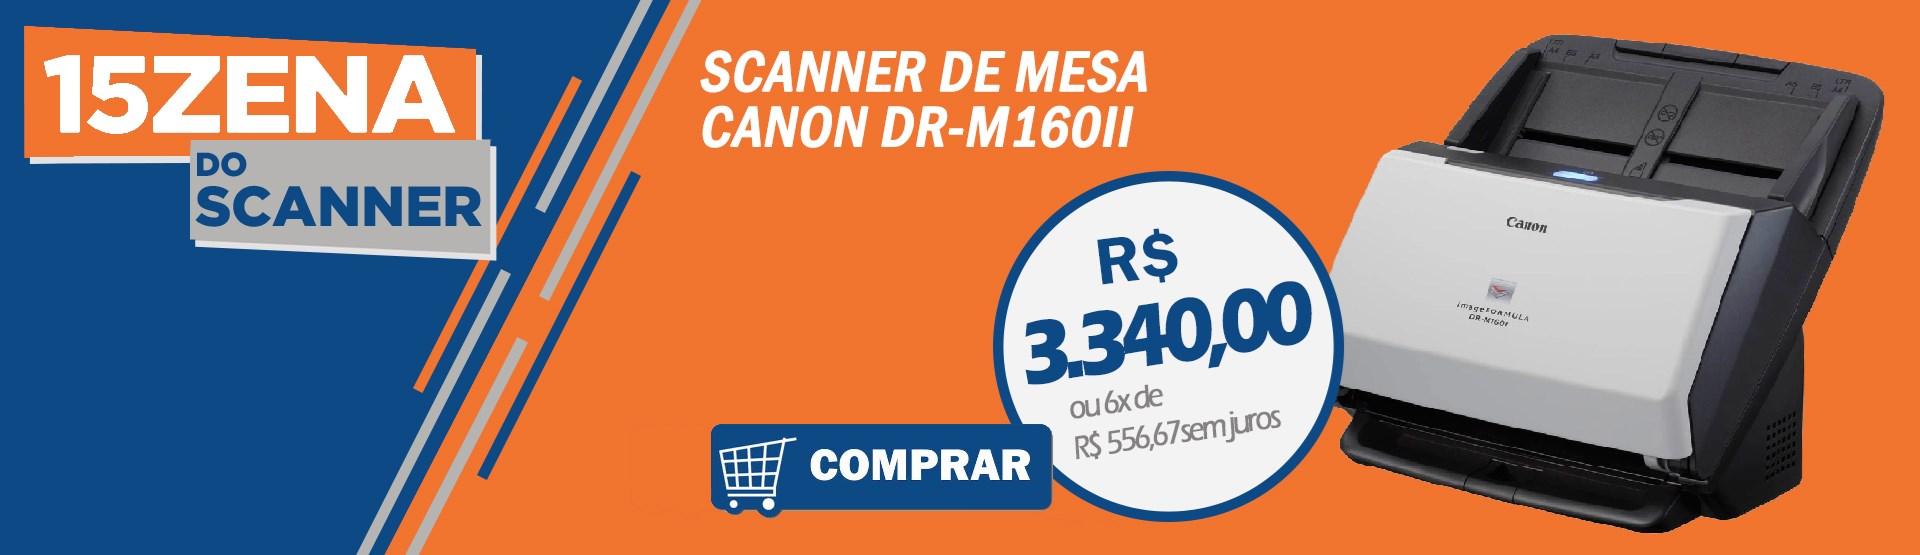 15zena DR-M160